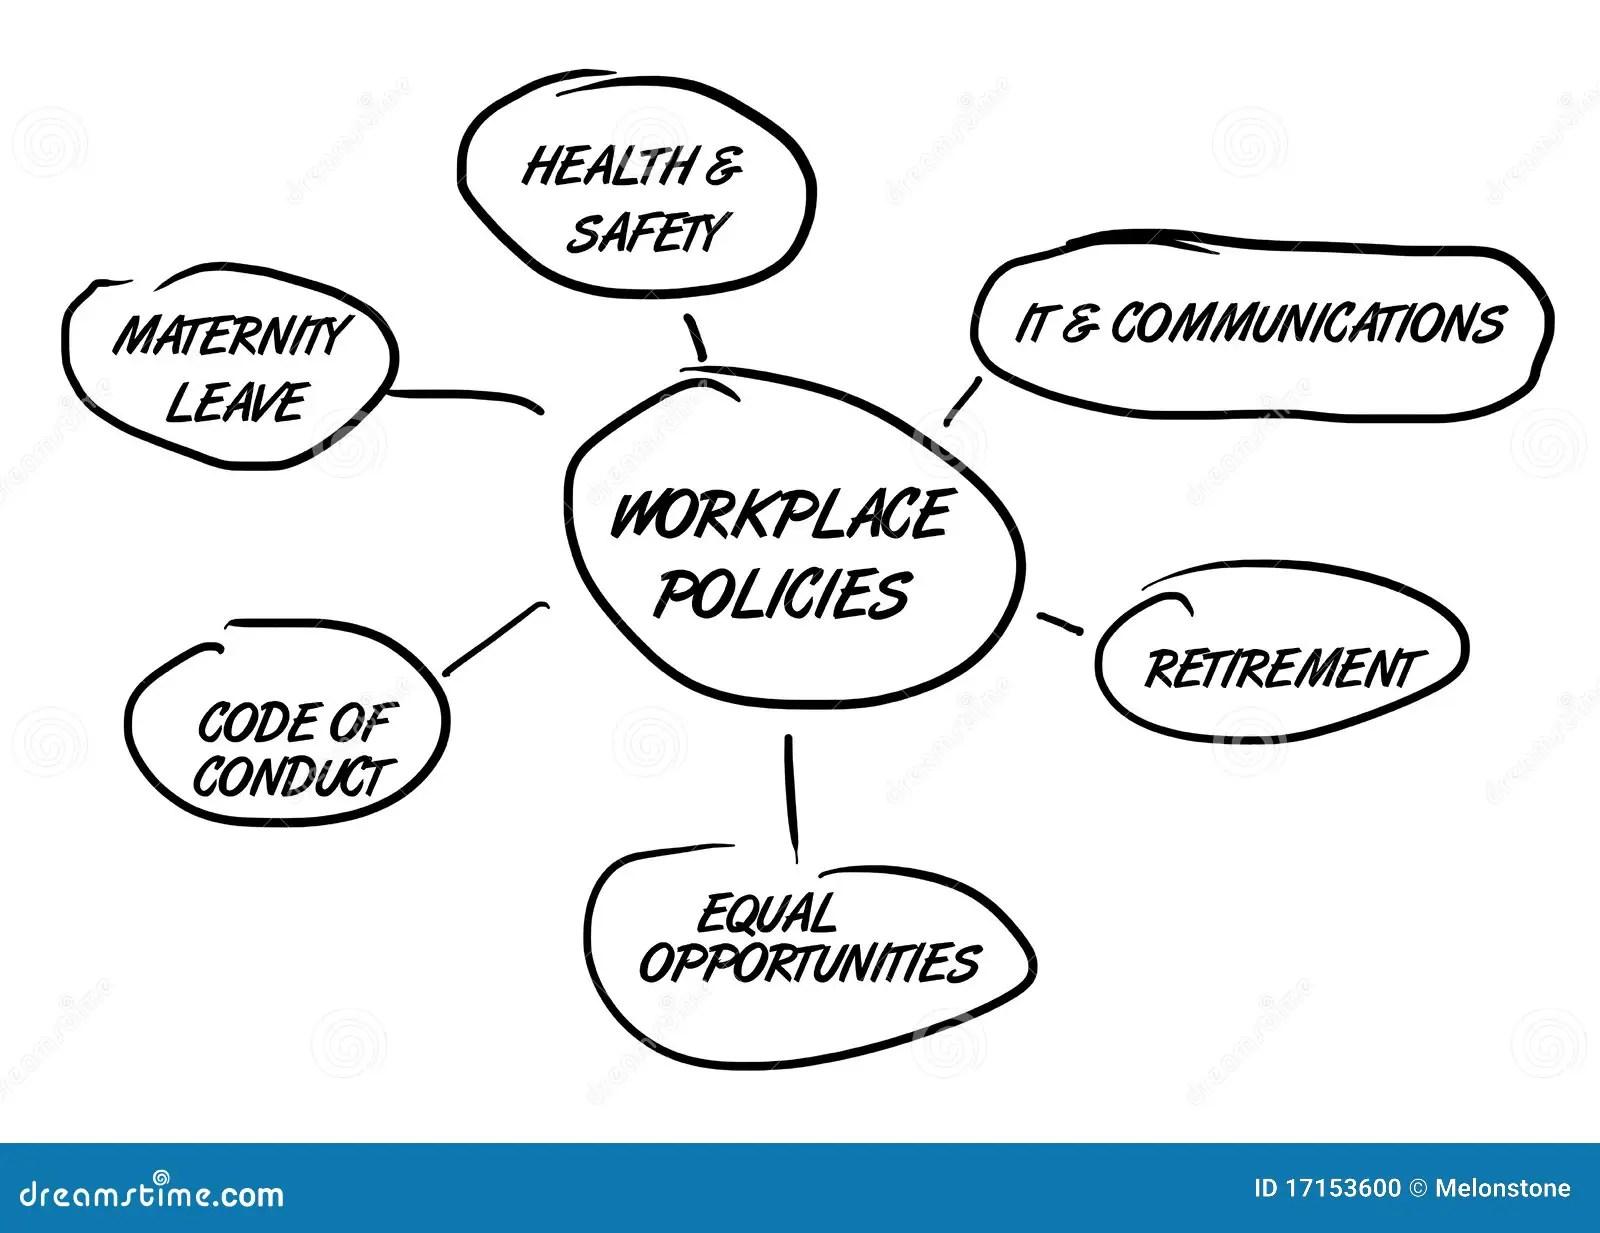 Organigramme De Politiques De Lieu De Travail Illustration